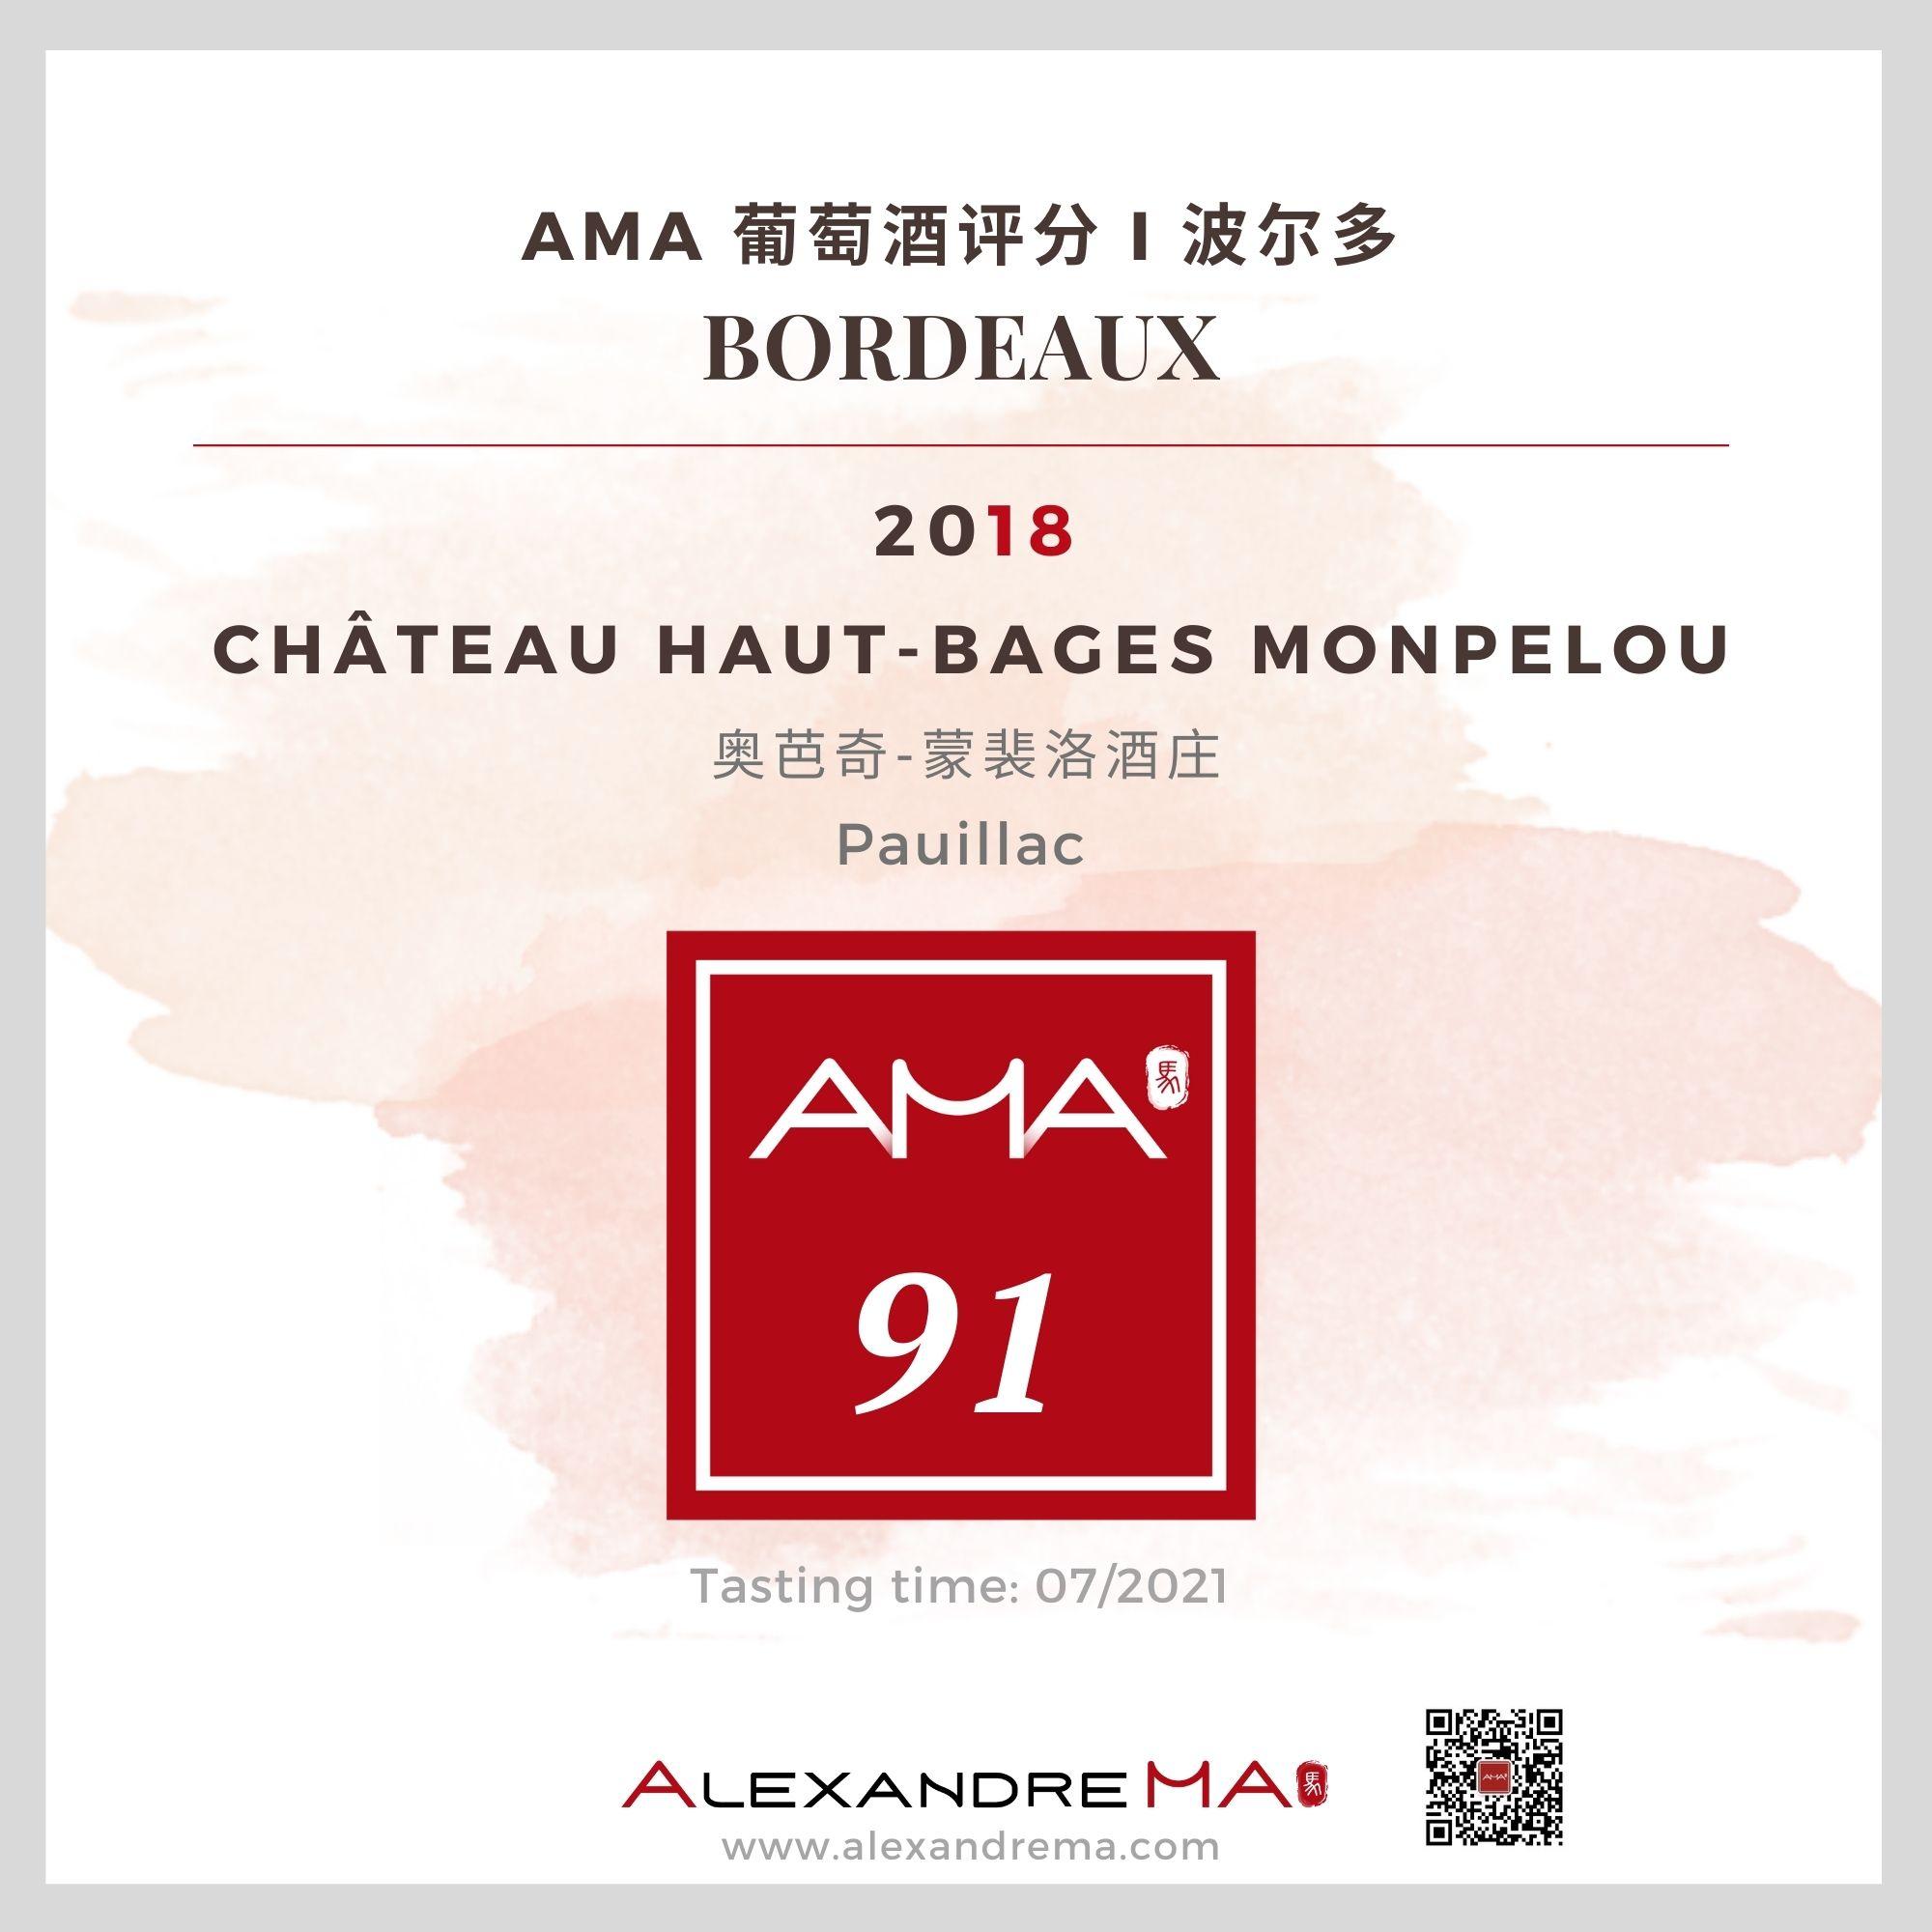 Château Haut-Bages Monpelou 2018 奥芭奇-蒙裴洛酒庄 - Alexandre Ma